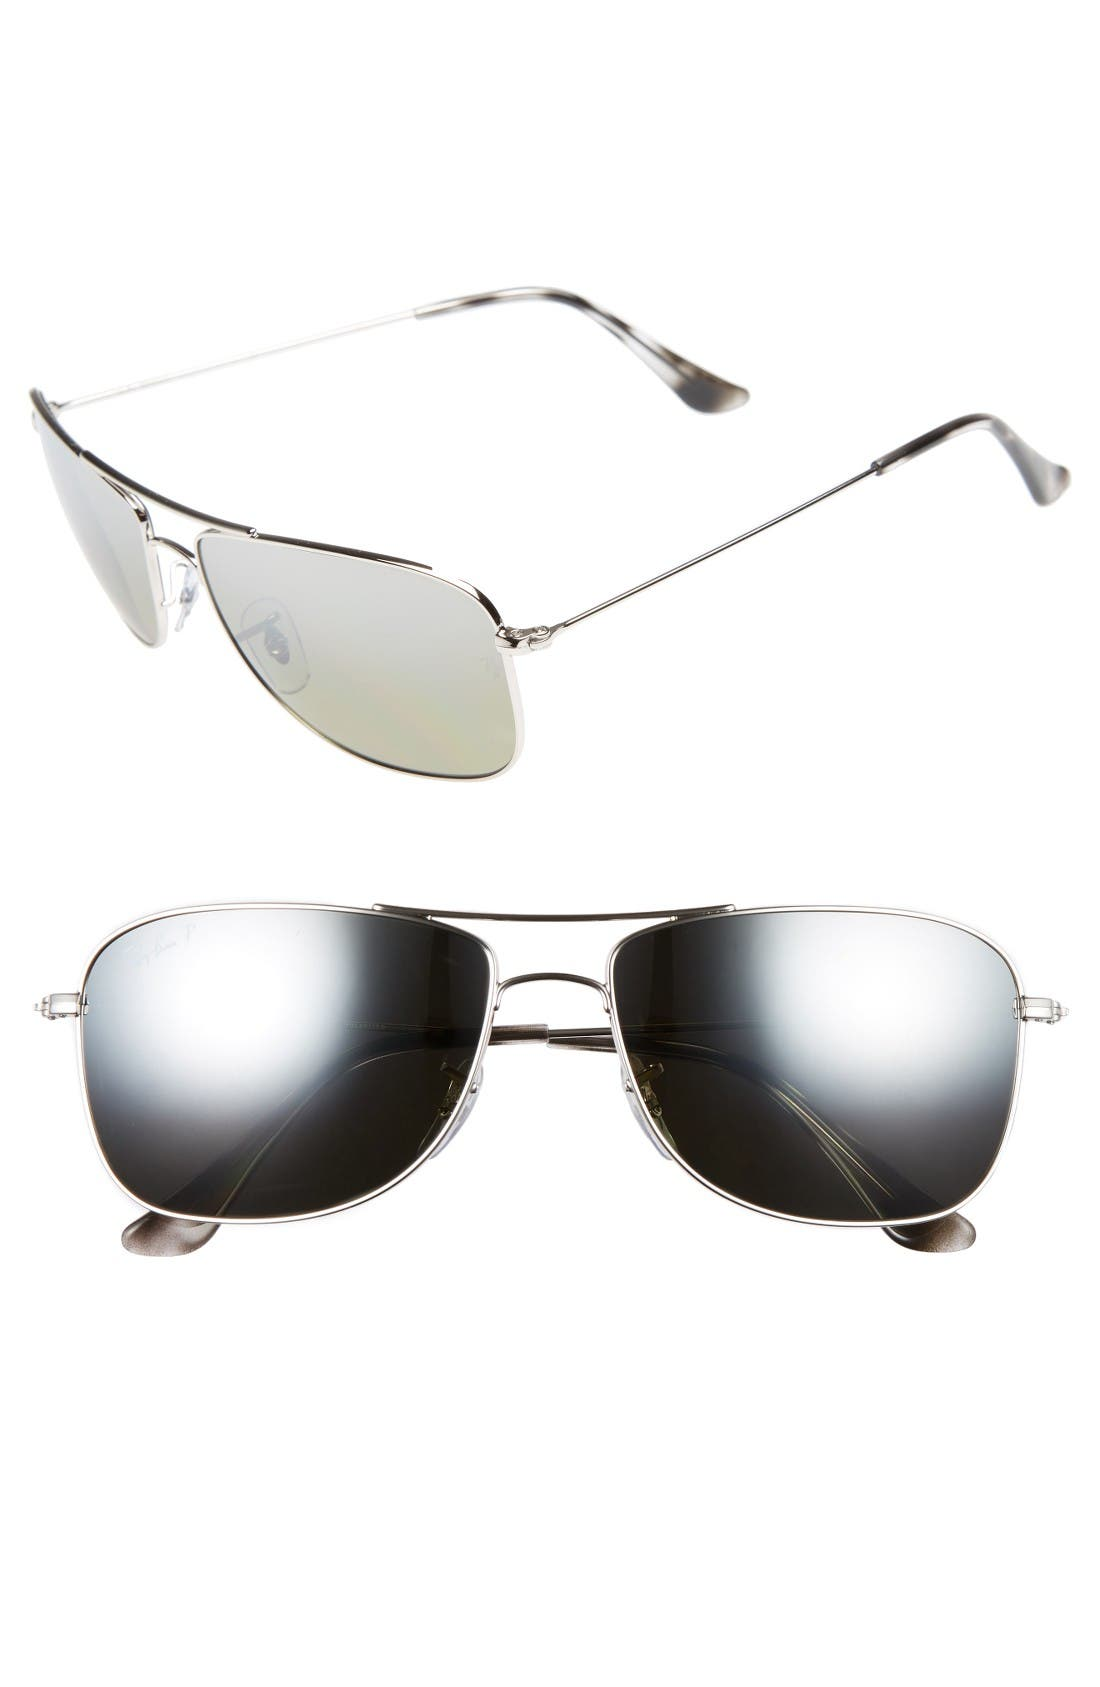 59mm Chromance Aviator Sunglasses,                             Main thumbnail 1, color,                             Shiny Silver/Grey Mirror